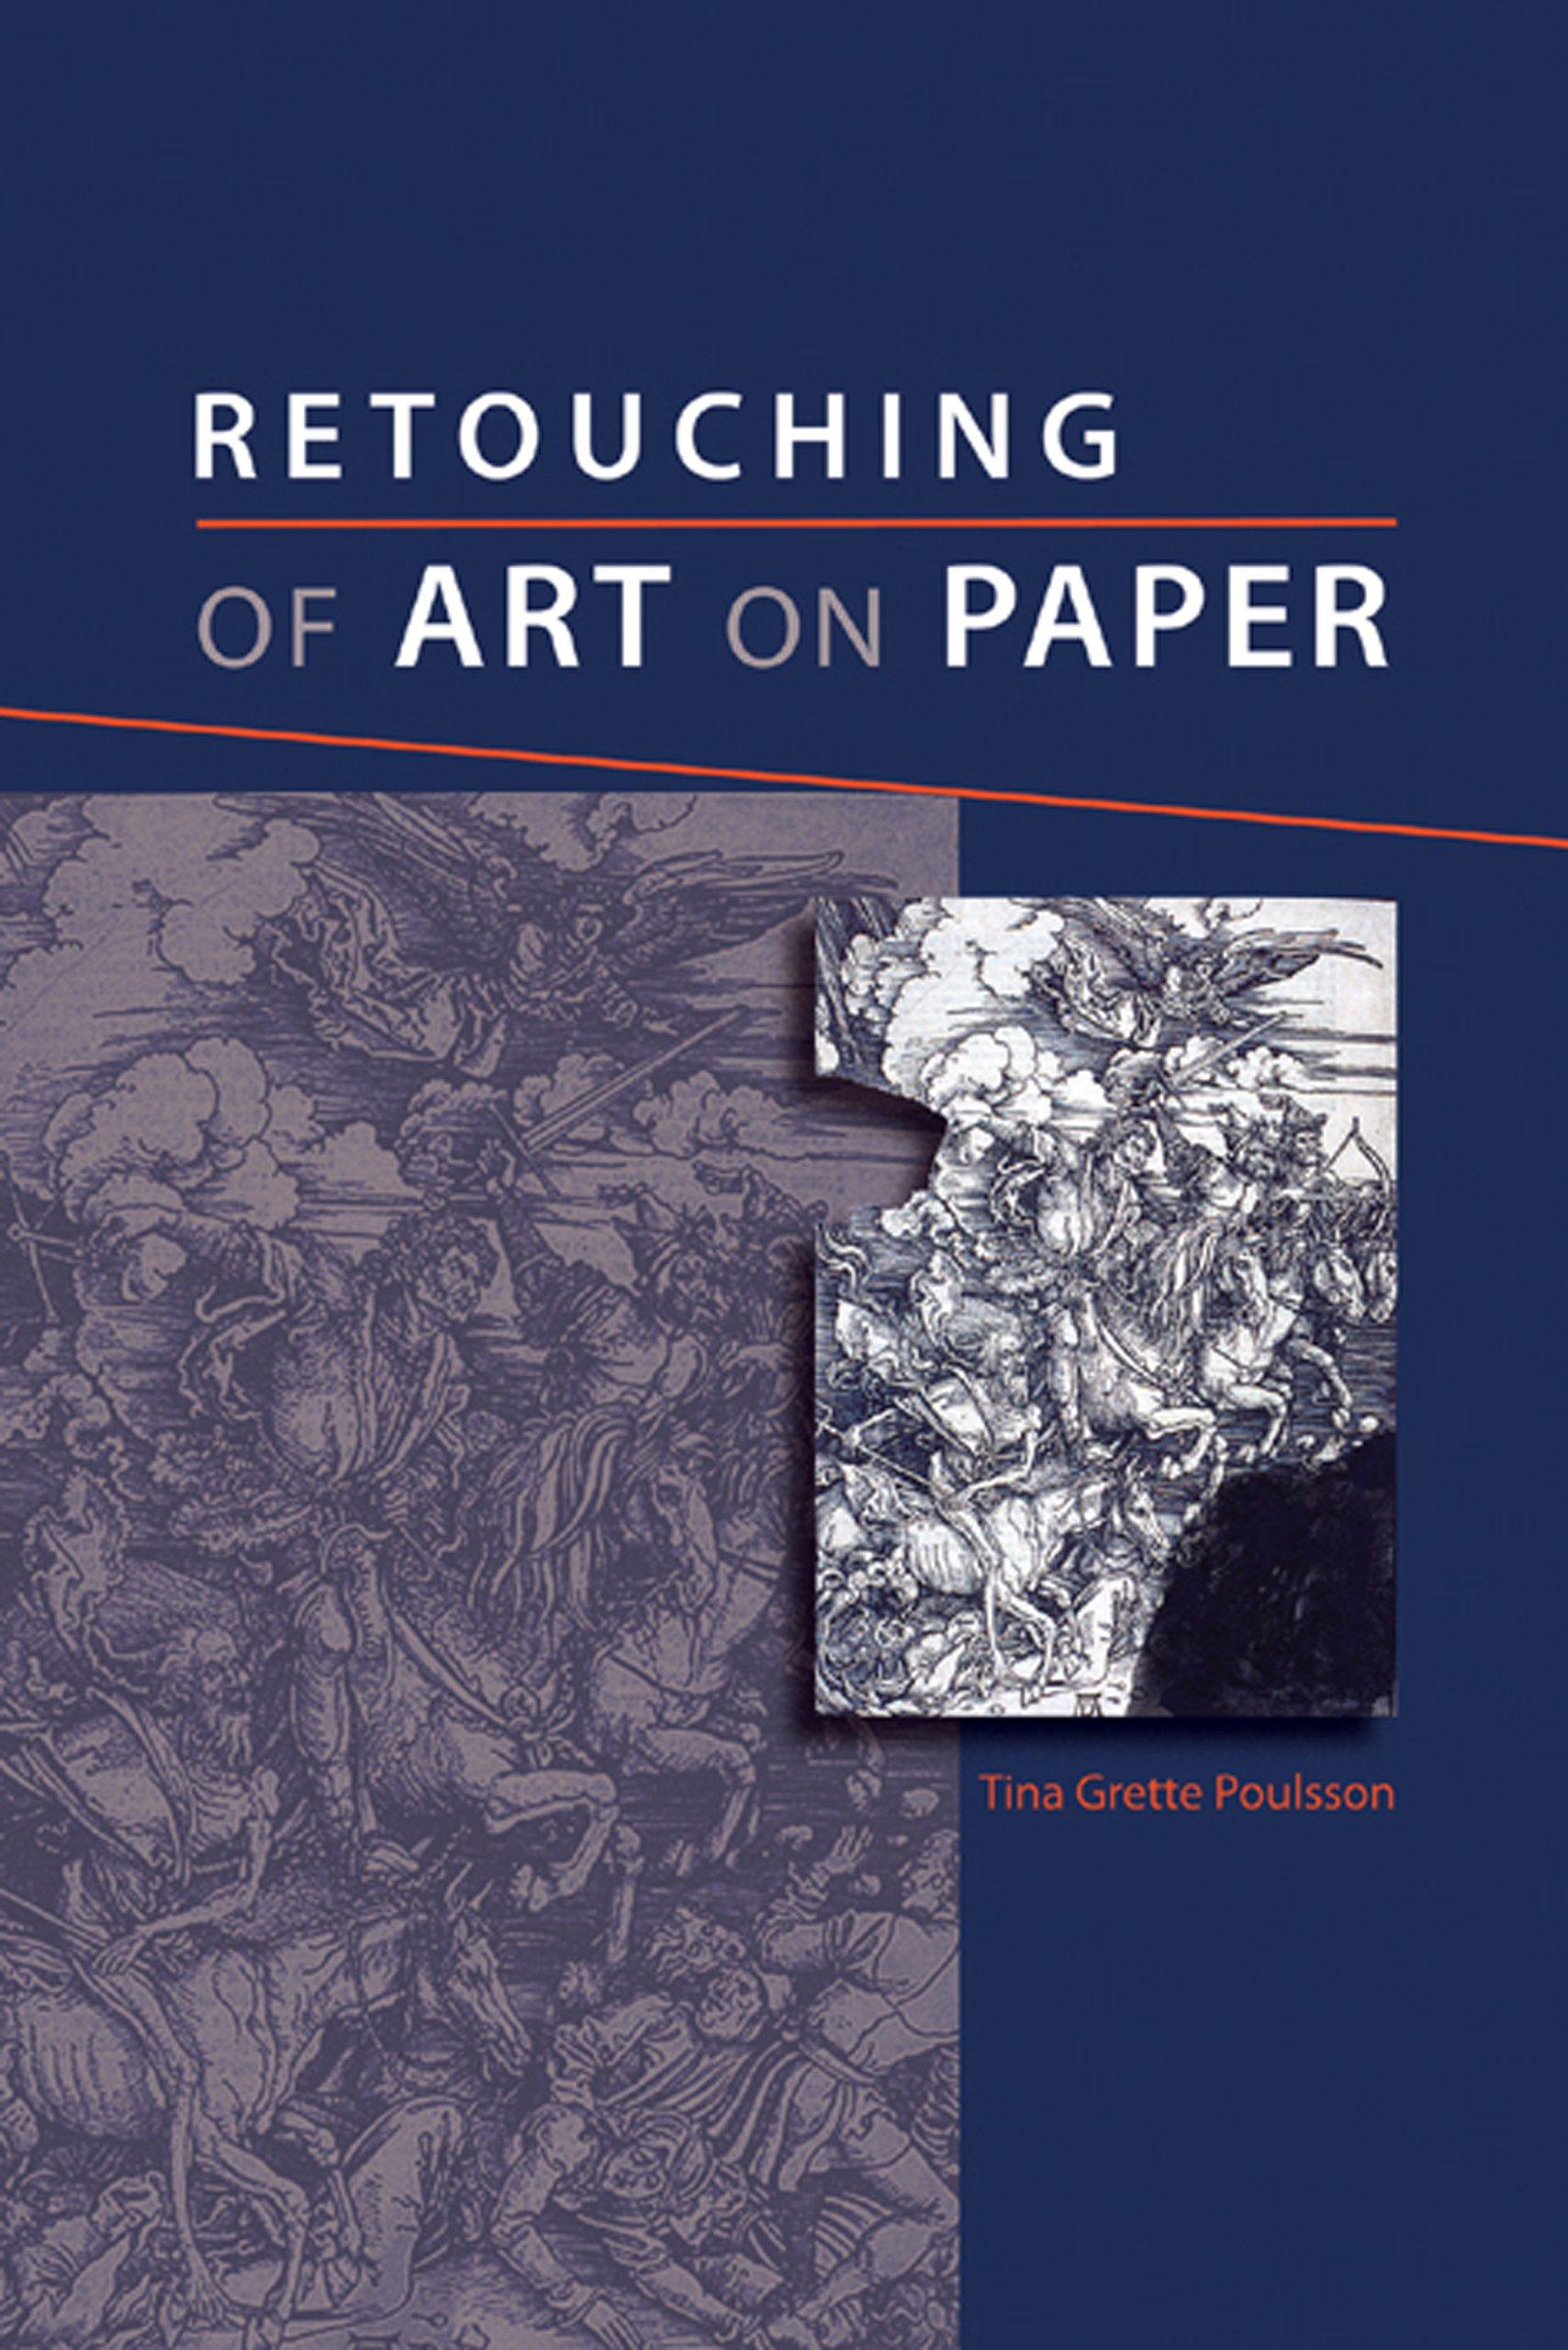 Retouching of Art on Paper por Tina Grette Poulsson